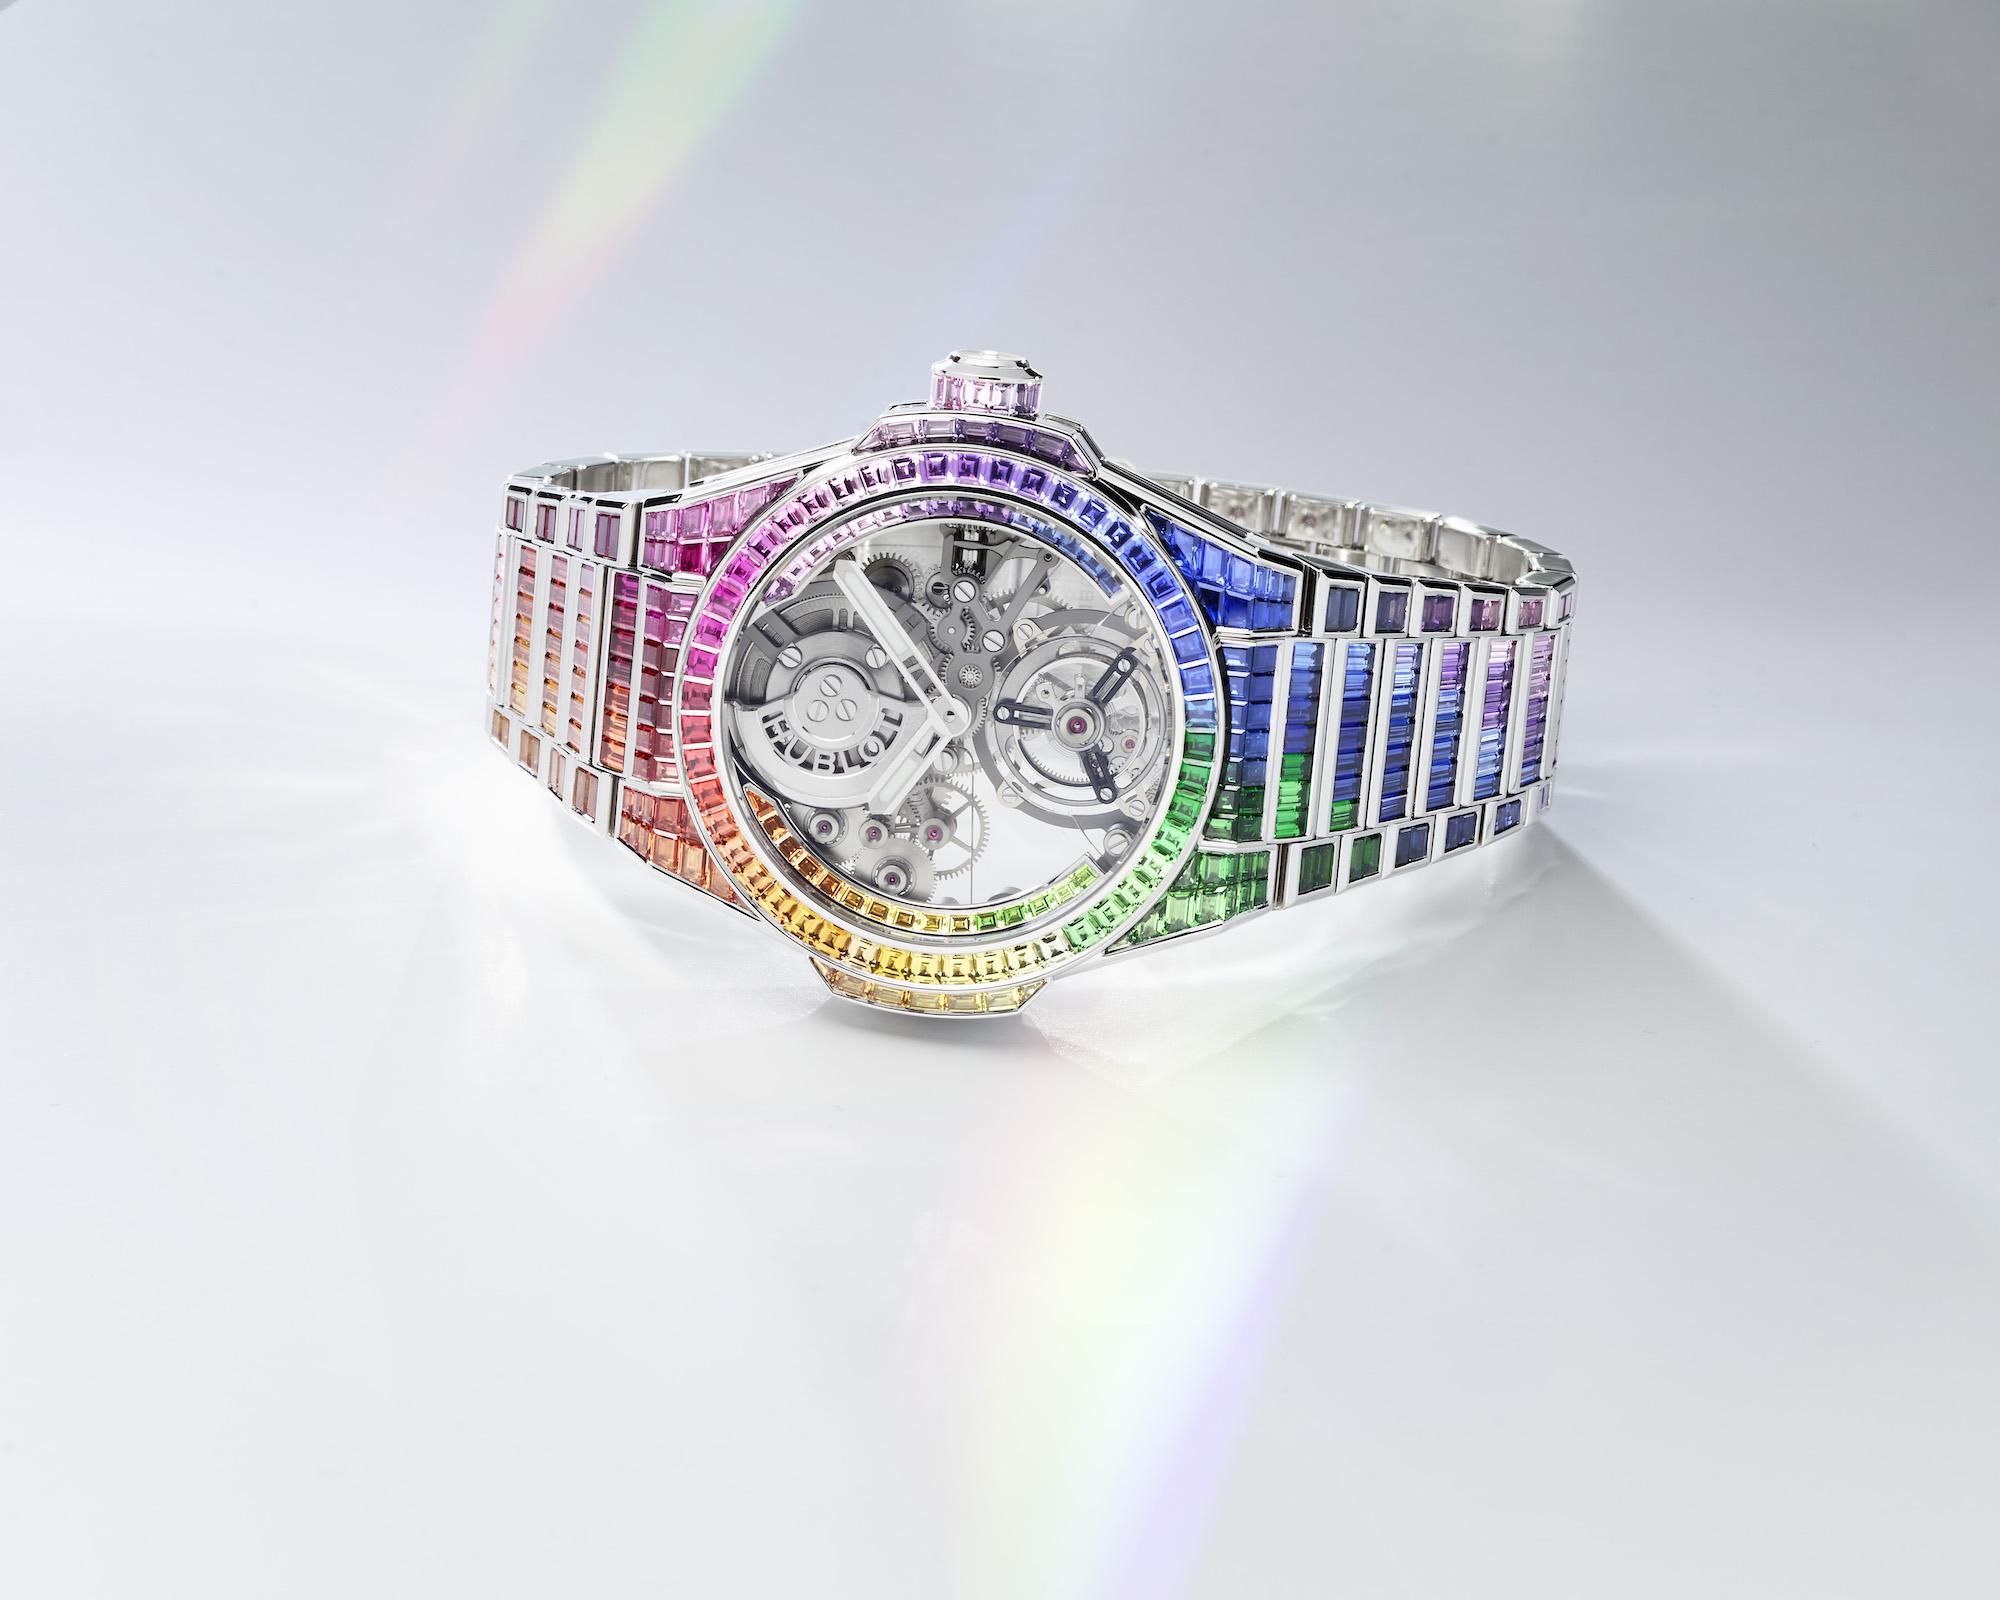 Hublot Big Bang Integral Tourbillon Rainbow 455.WX.9900.WX.9999 Lifestyle 2